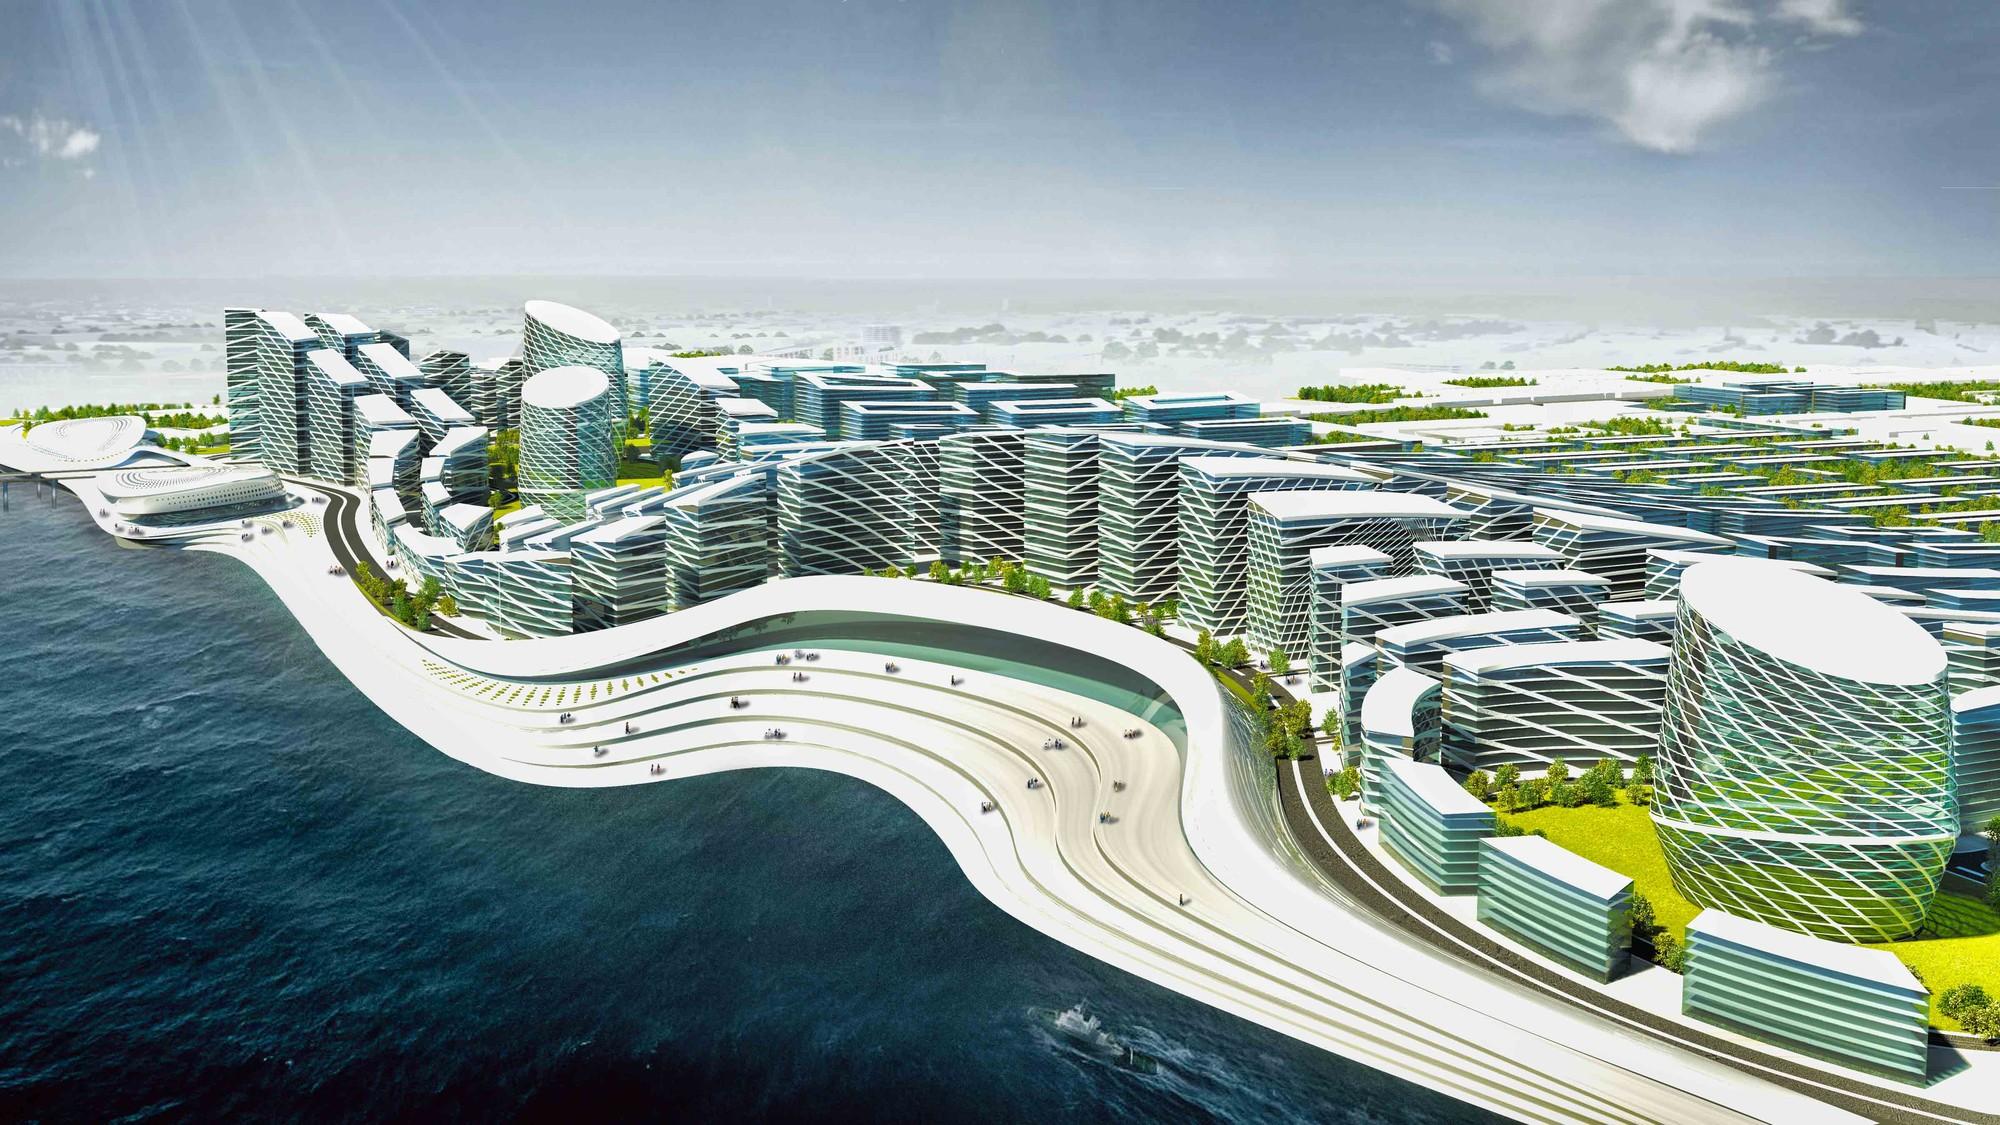 Kanpur Riverfront Development Proposal Studio Symbiosis